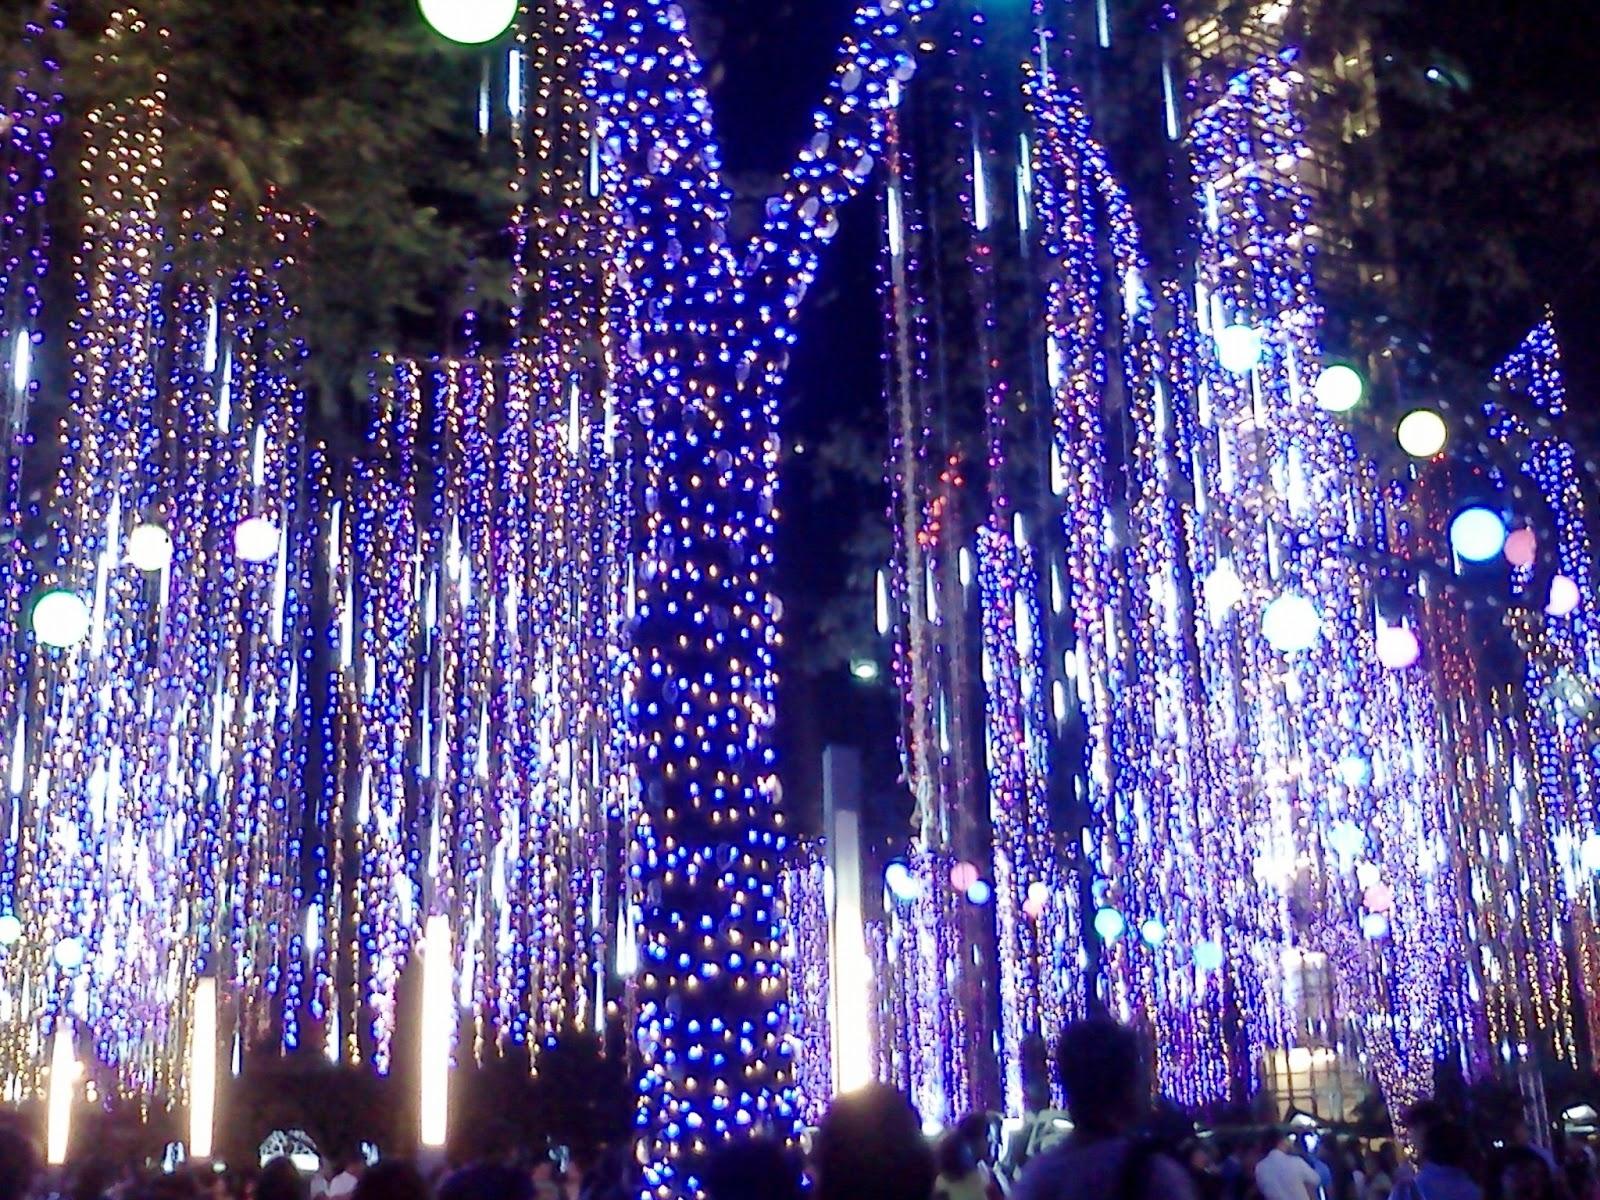 Teardrop Christmas Lights.Krissylicious Enchanting Christmas Lights And Sounds At